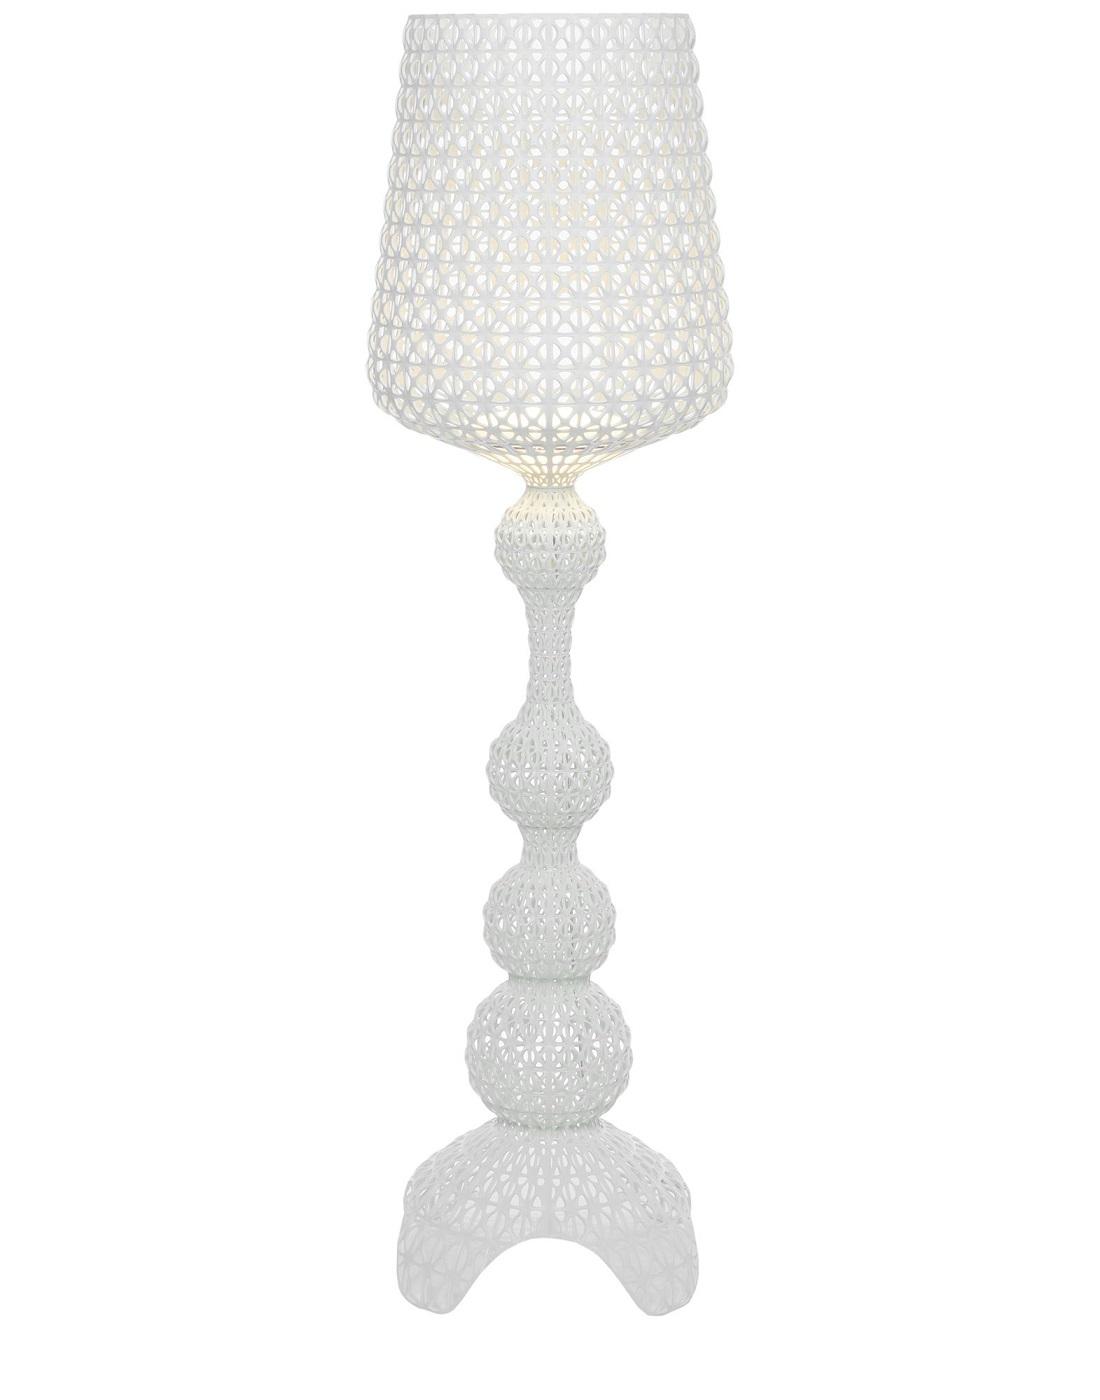 Lampada da terra Kartell Kabuki bianca, Newformsdesign | lampade da ...